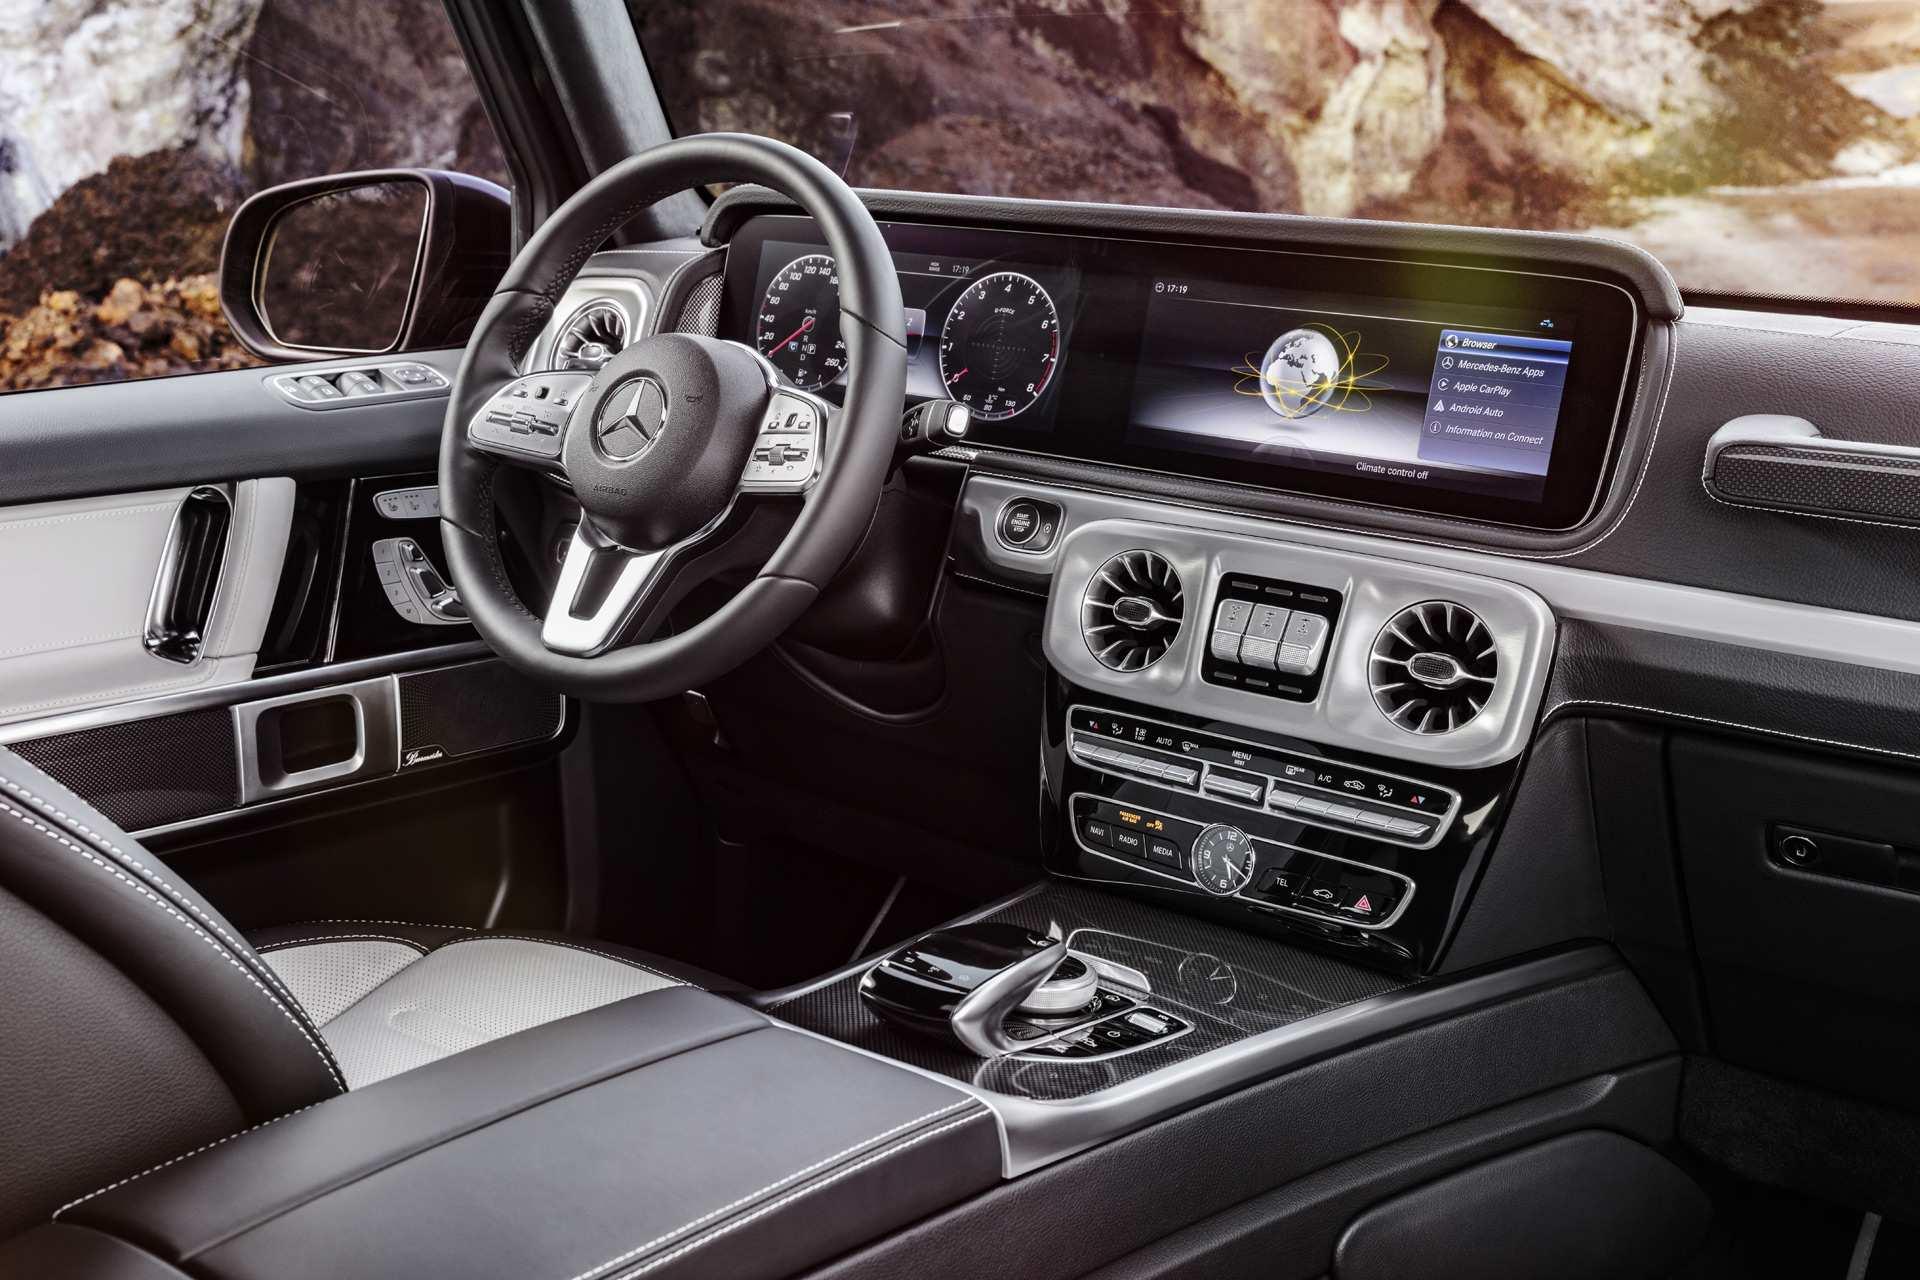 61 Gallery of Mercedes G Klasse 2020 Exterior and Interior for Mercedes G Klasse 2020